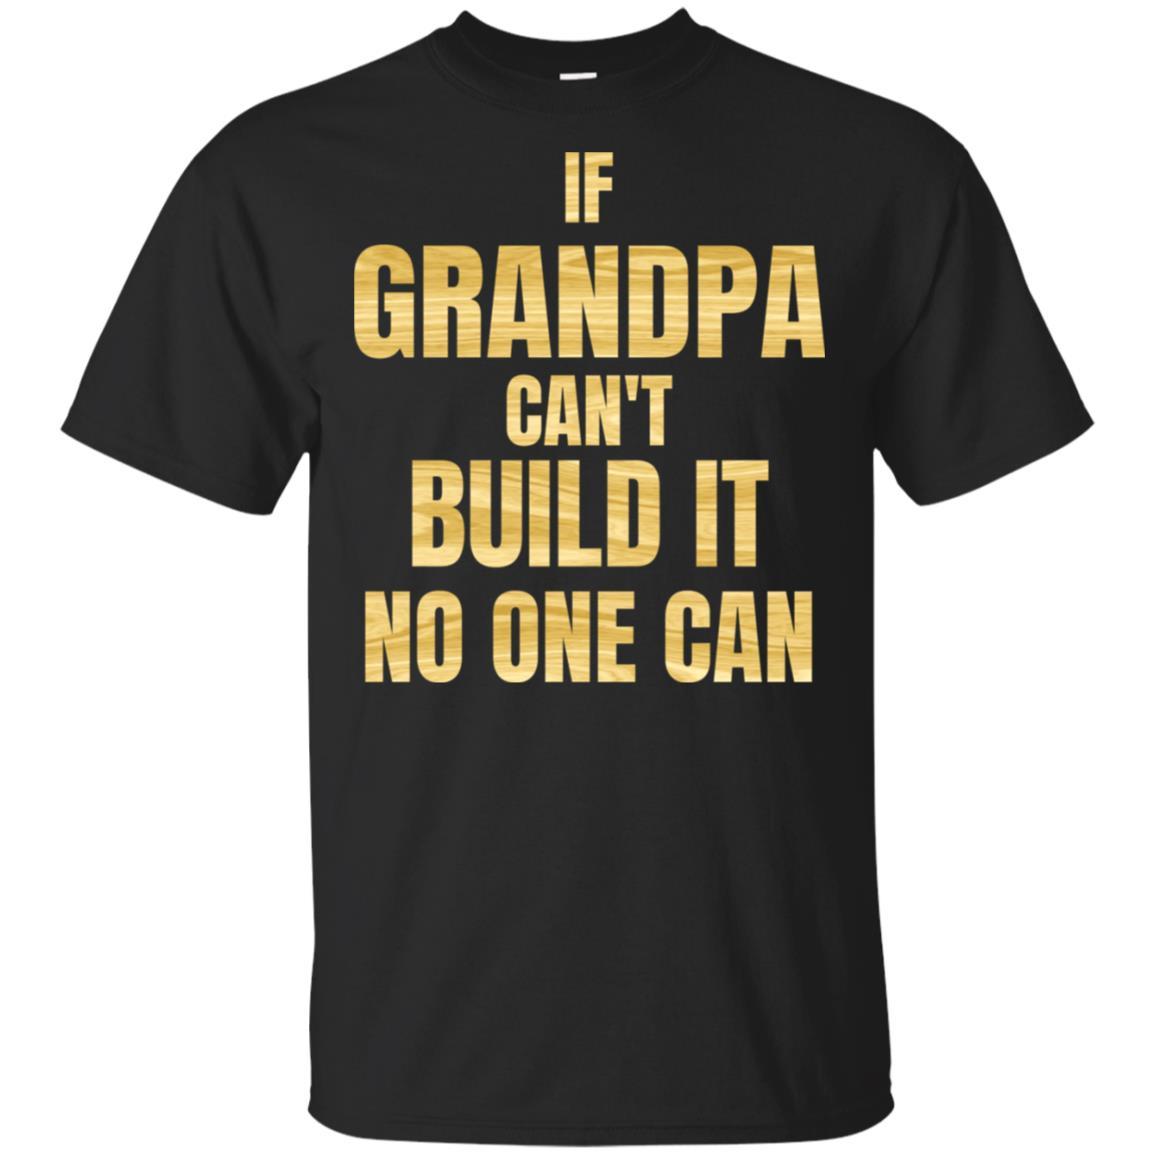 Carpenter Grandpa Quote Funny Sayings Unisex Short Sleeve